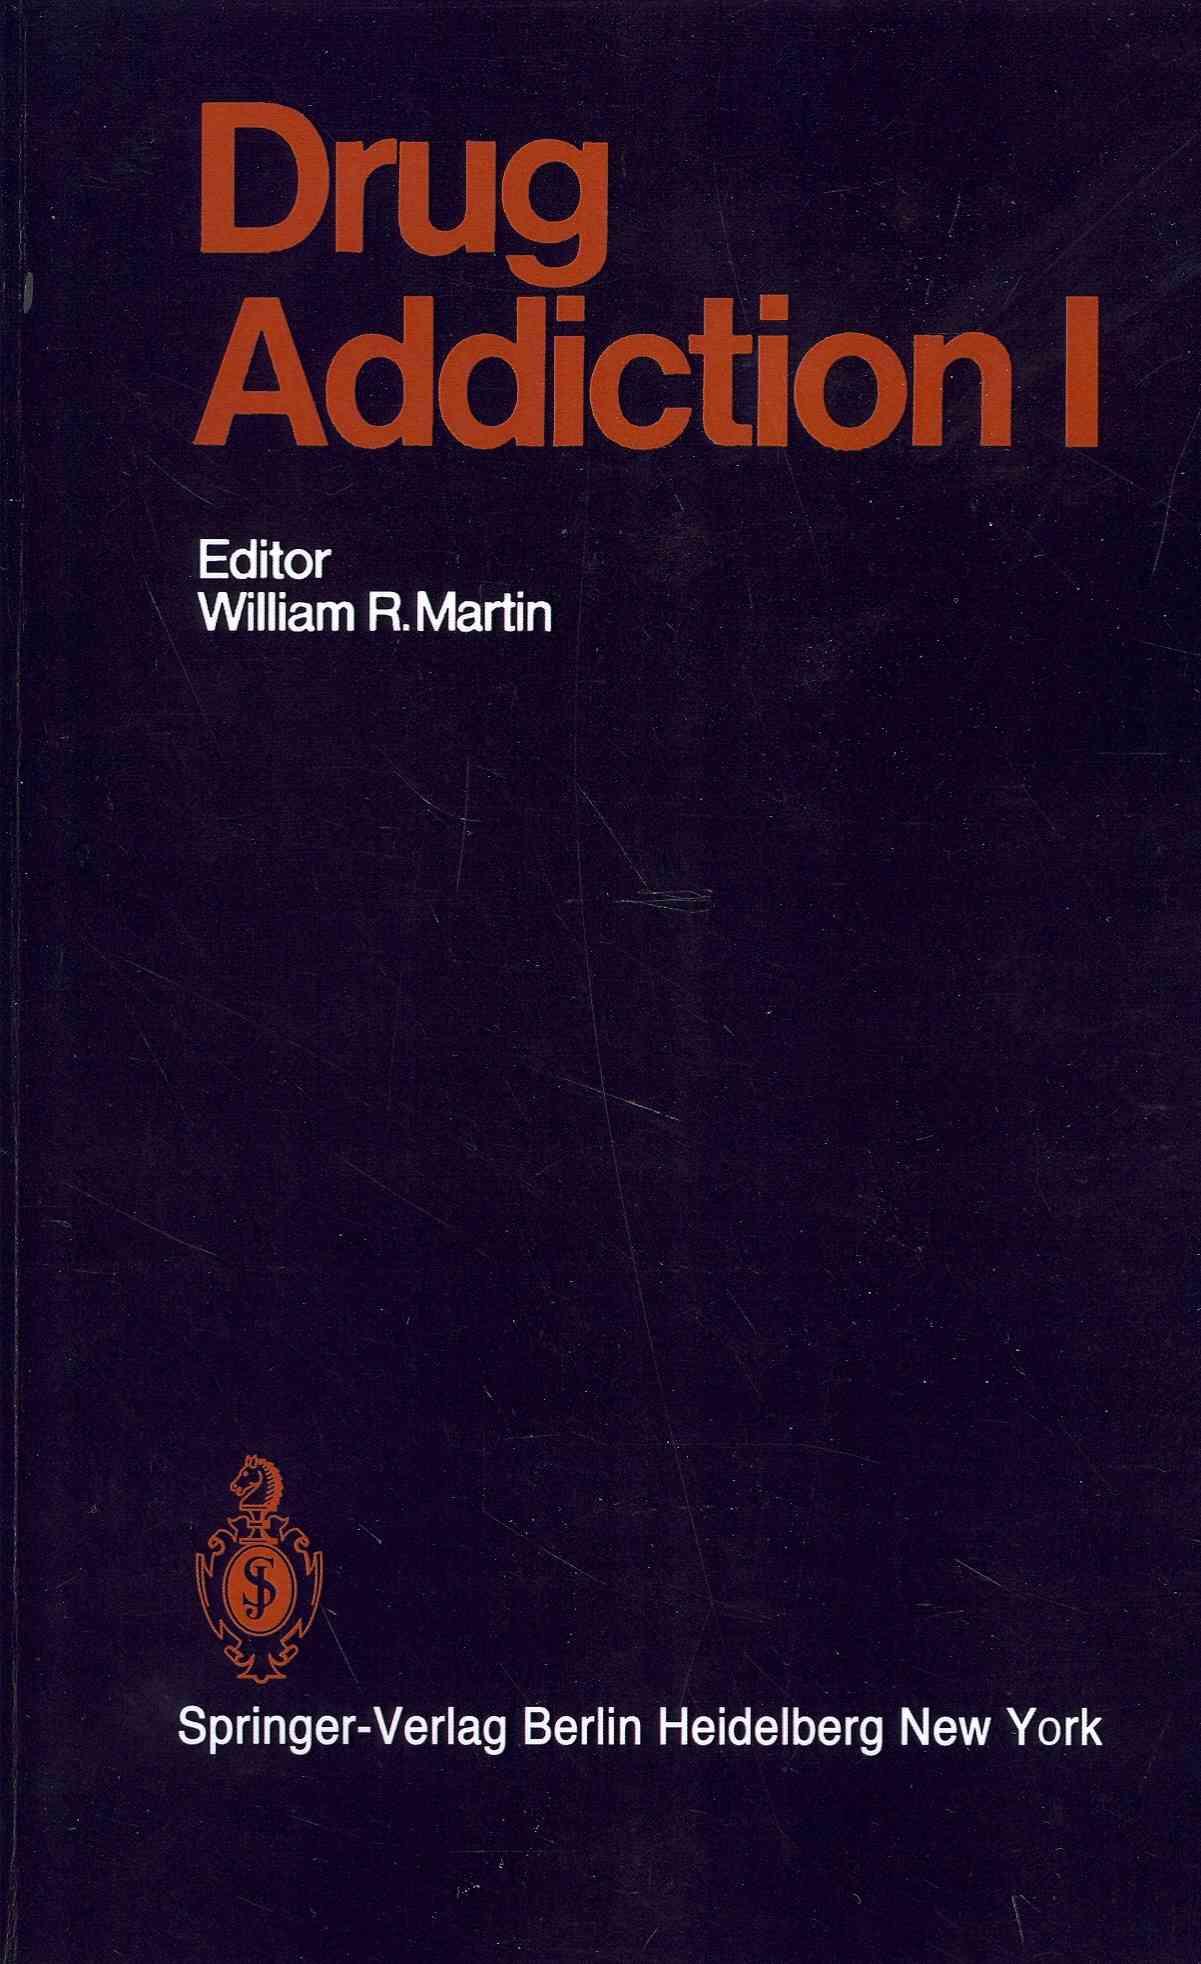 Drug Addiction I By Conrad, H. T. (CON)/ Fraser, H. F. (CON)/ Gorodetzky, C. W. (CON)/ Jasinski, D. R. (CON)/ Kielholz, P. (CON)